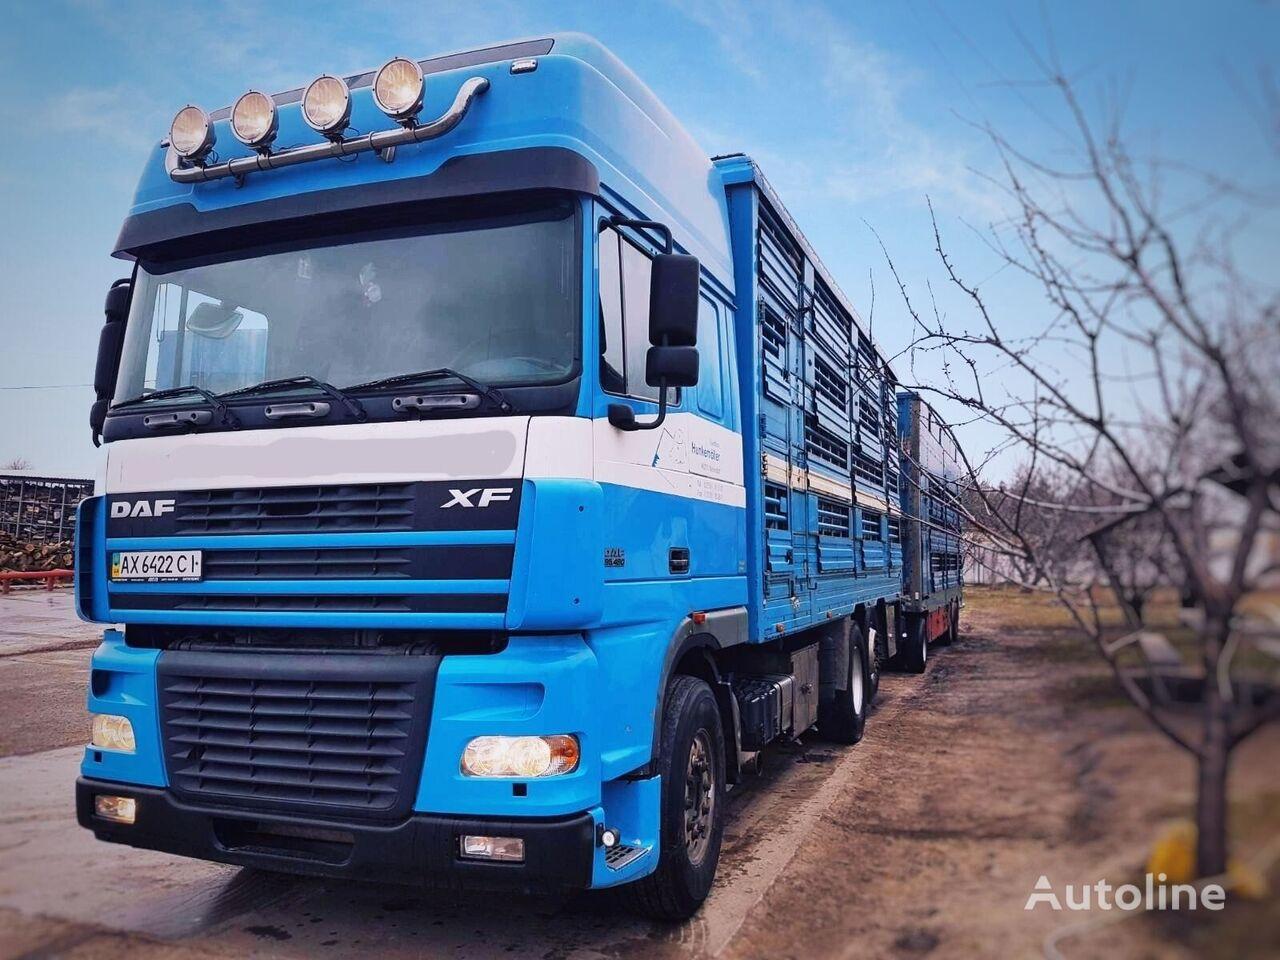 camion transport animale PEZZAIOLI + remorcă transport animale